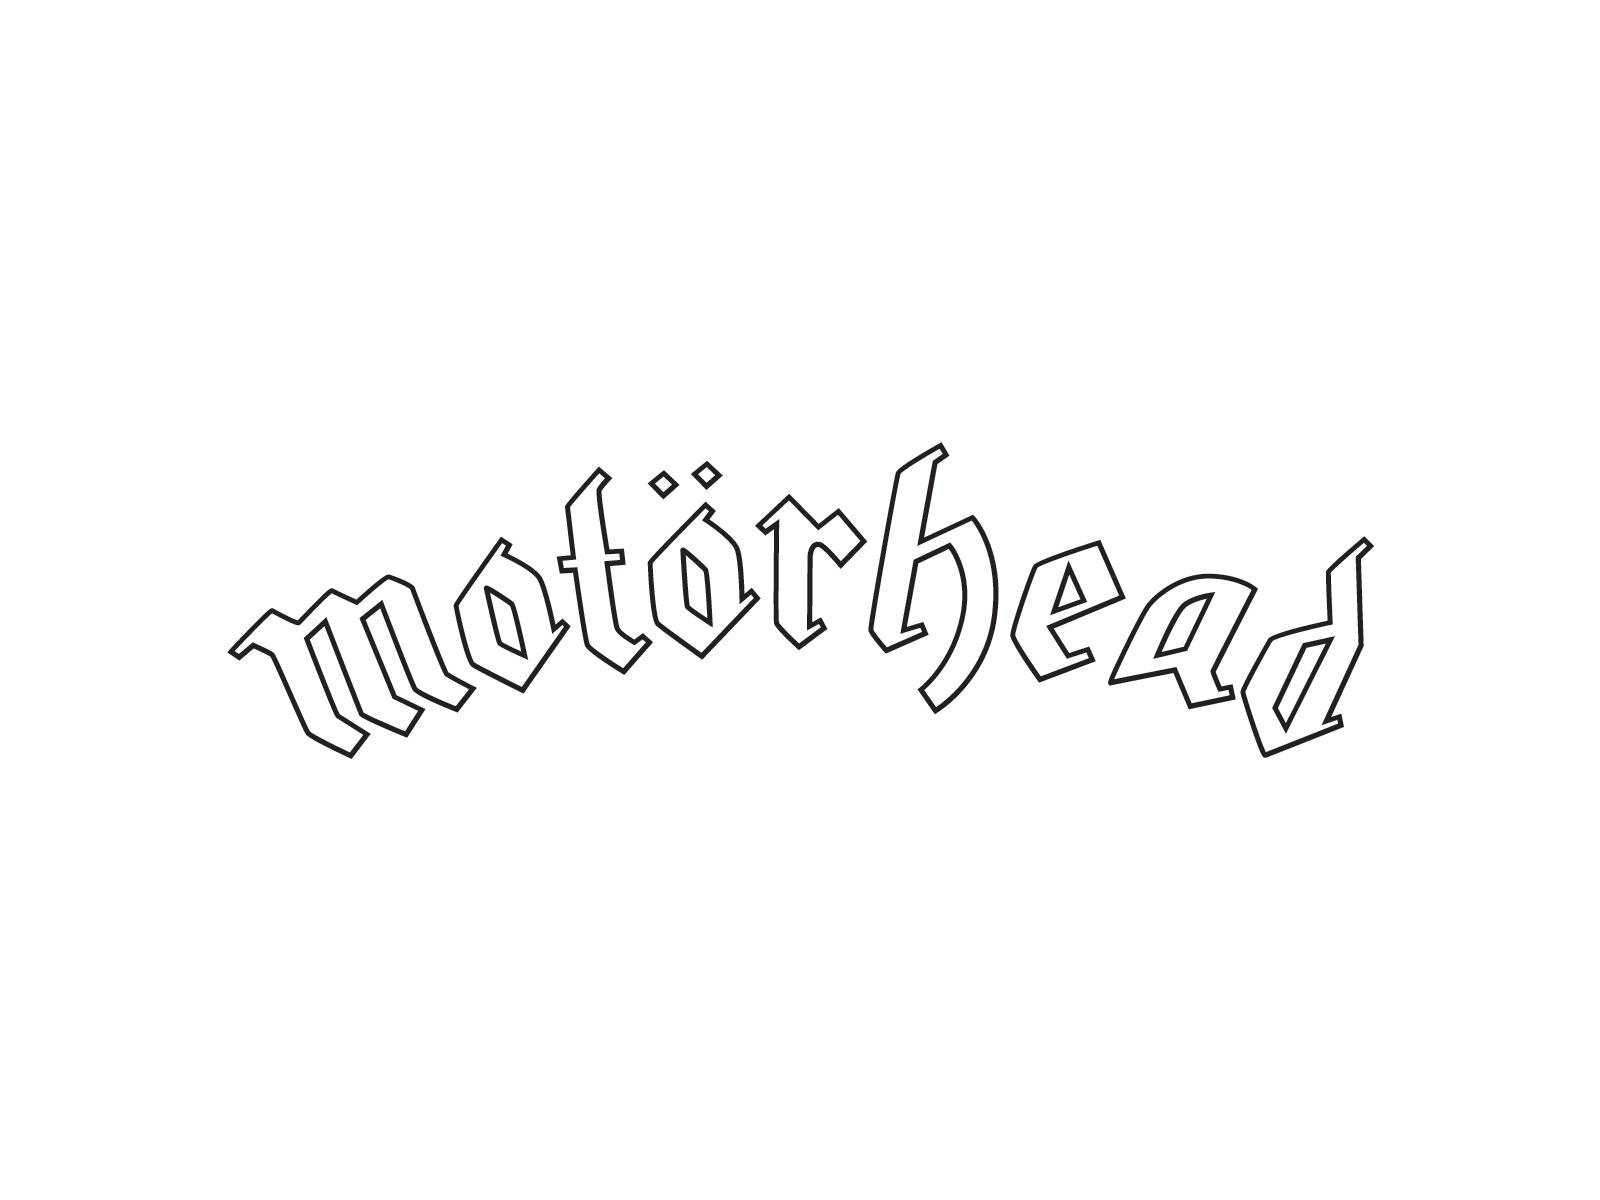 Motorhead Motorhead logo wallpaper 1600x1200